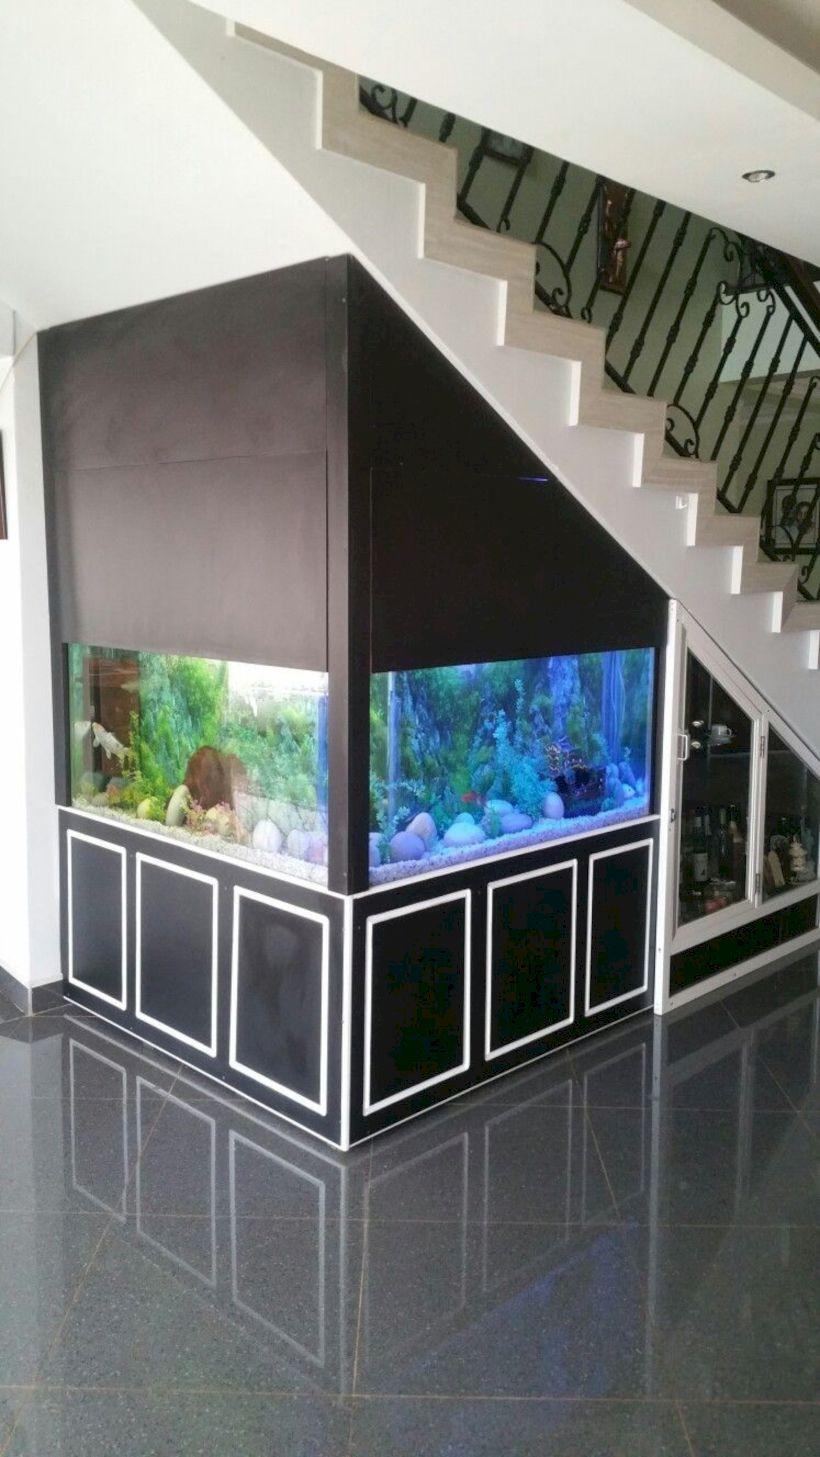 46 Aquarium Stairs Design Ideas Home Stairs Design Stairs Design House Stairs